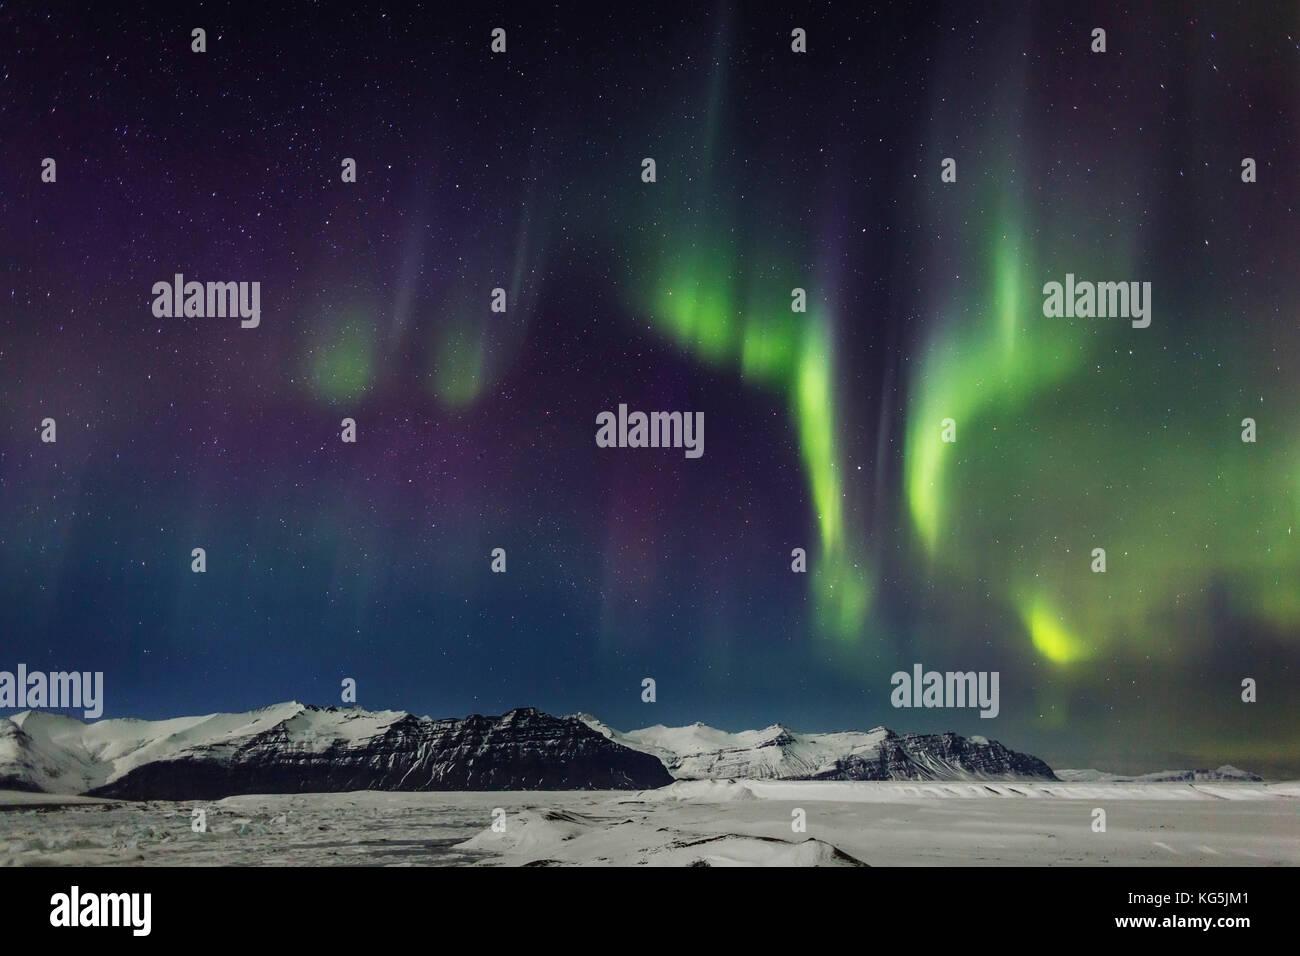 Auroras und Eisberge an der Gletschersee Jökulsárlón, breidamerkurjokull, Eiskappe des Vatnajökull, Stockbild